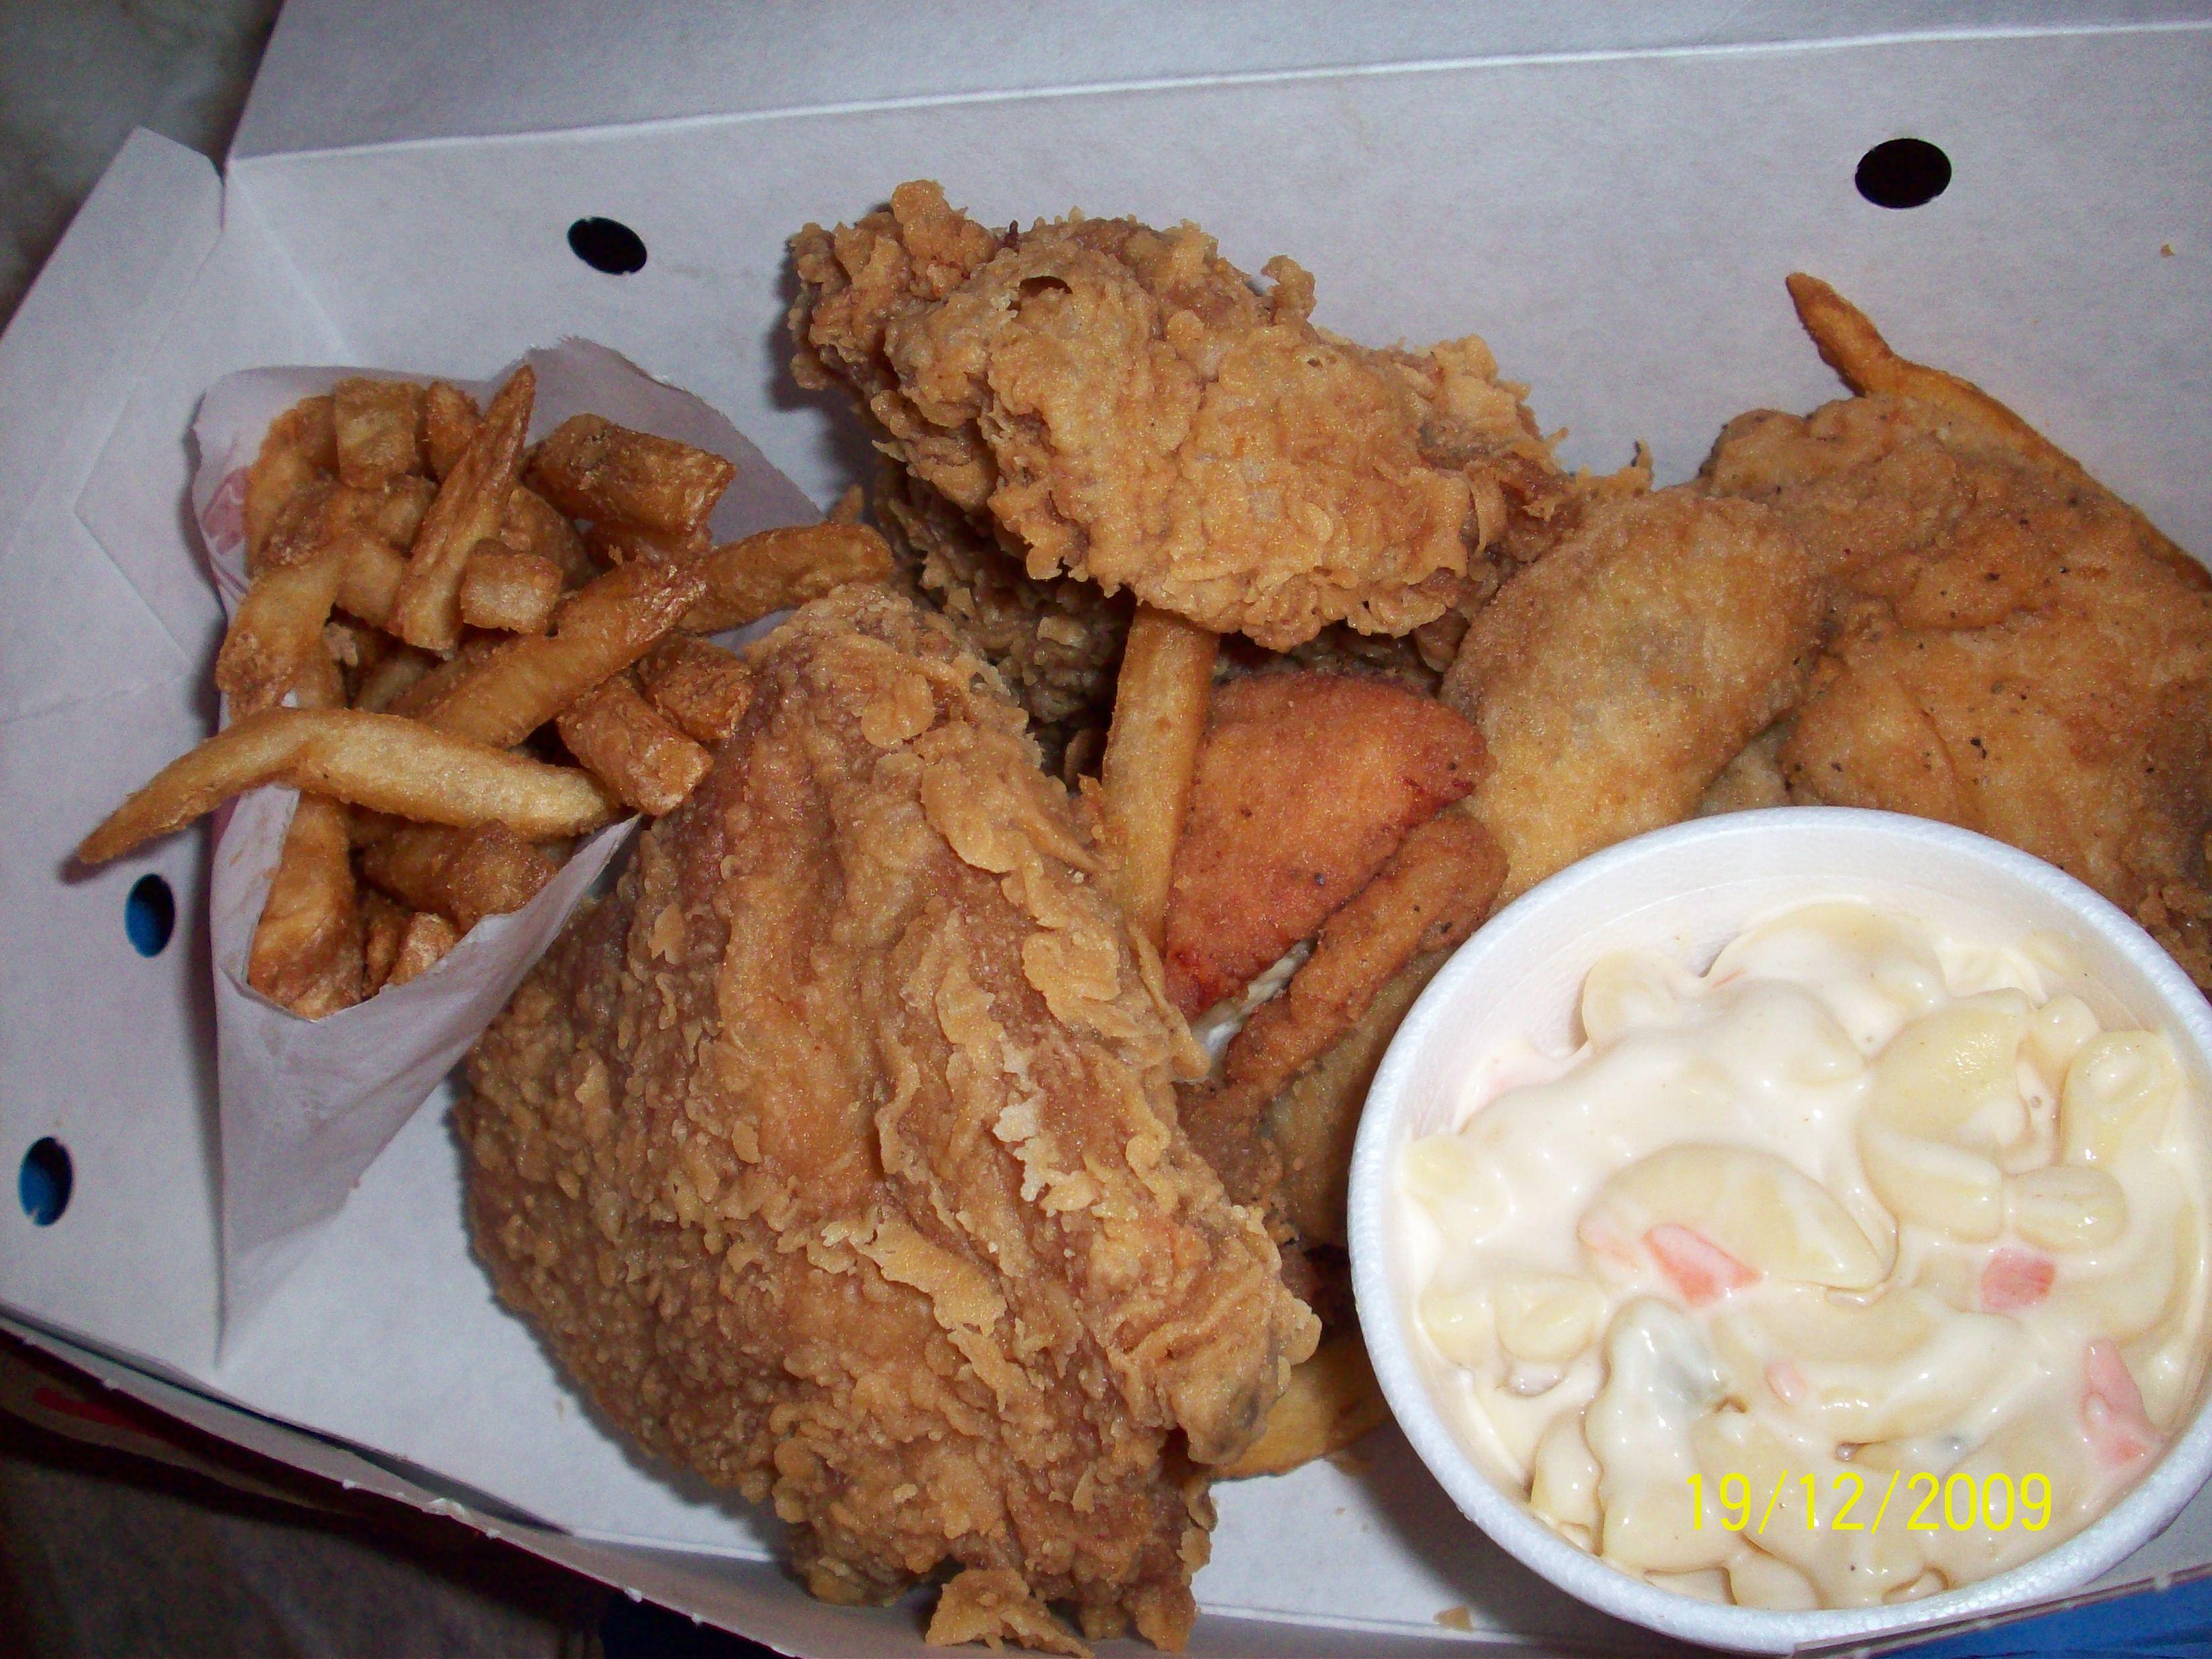 http://foodloader.net/cutie_2009-12-19_KFC_Meal.jpg